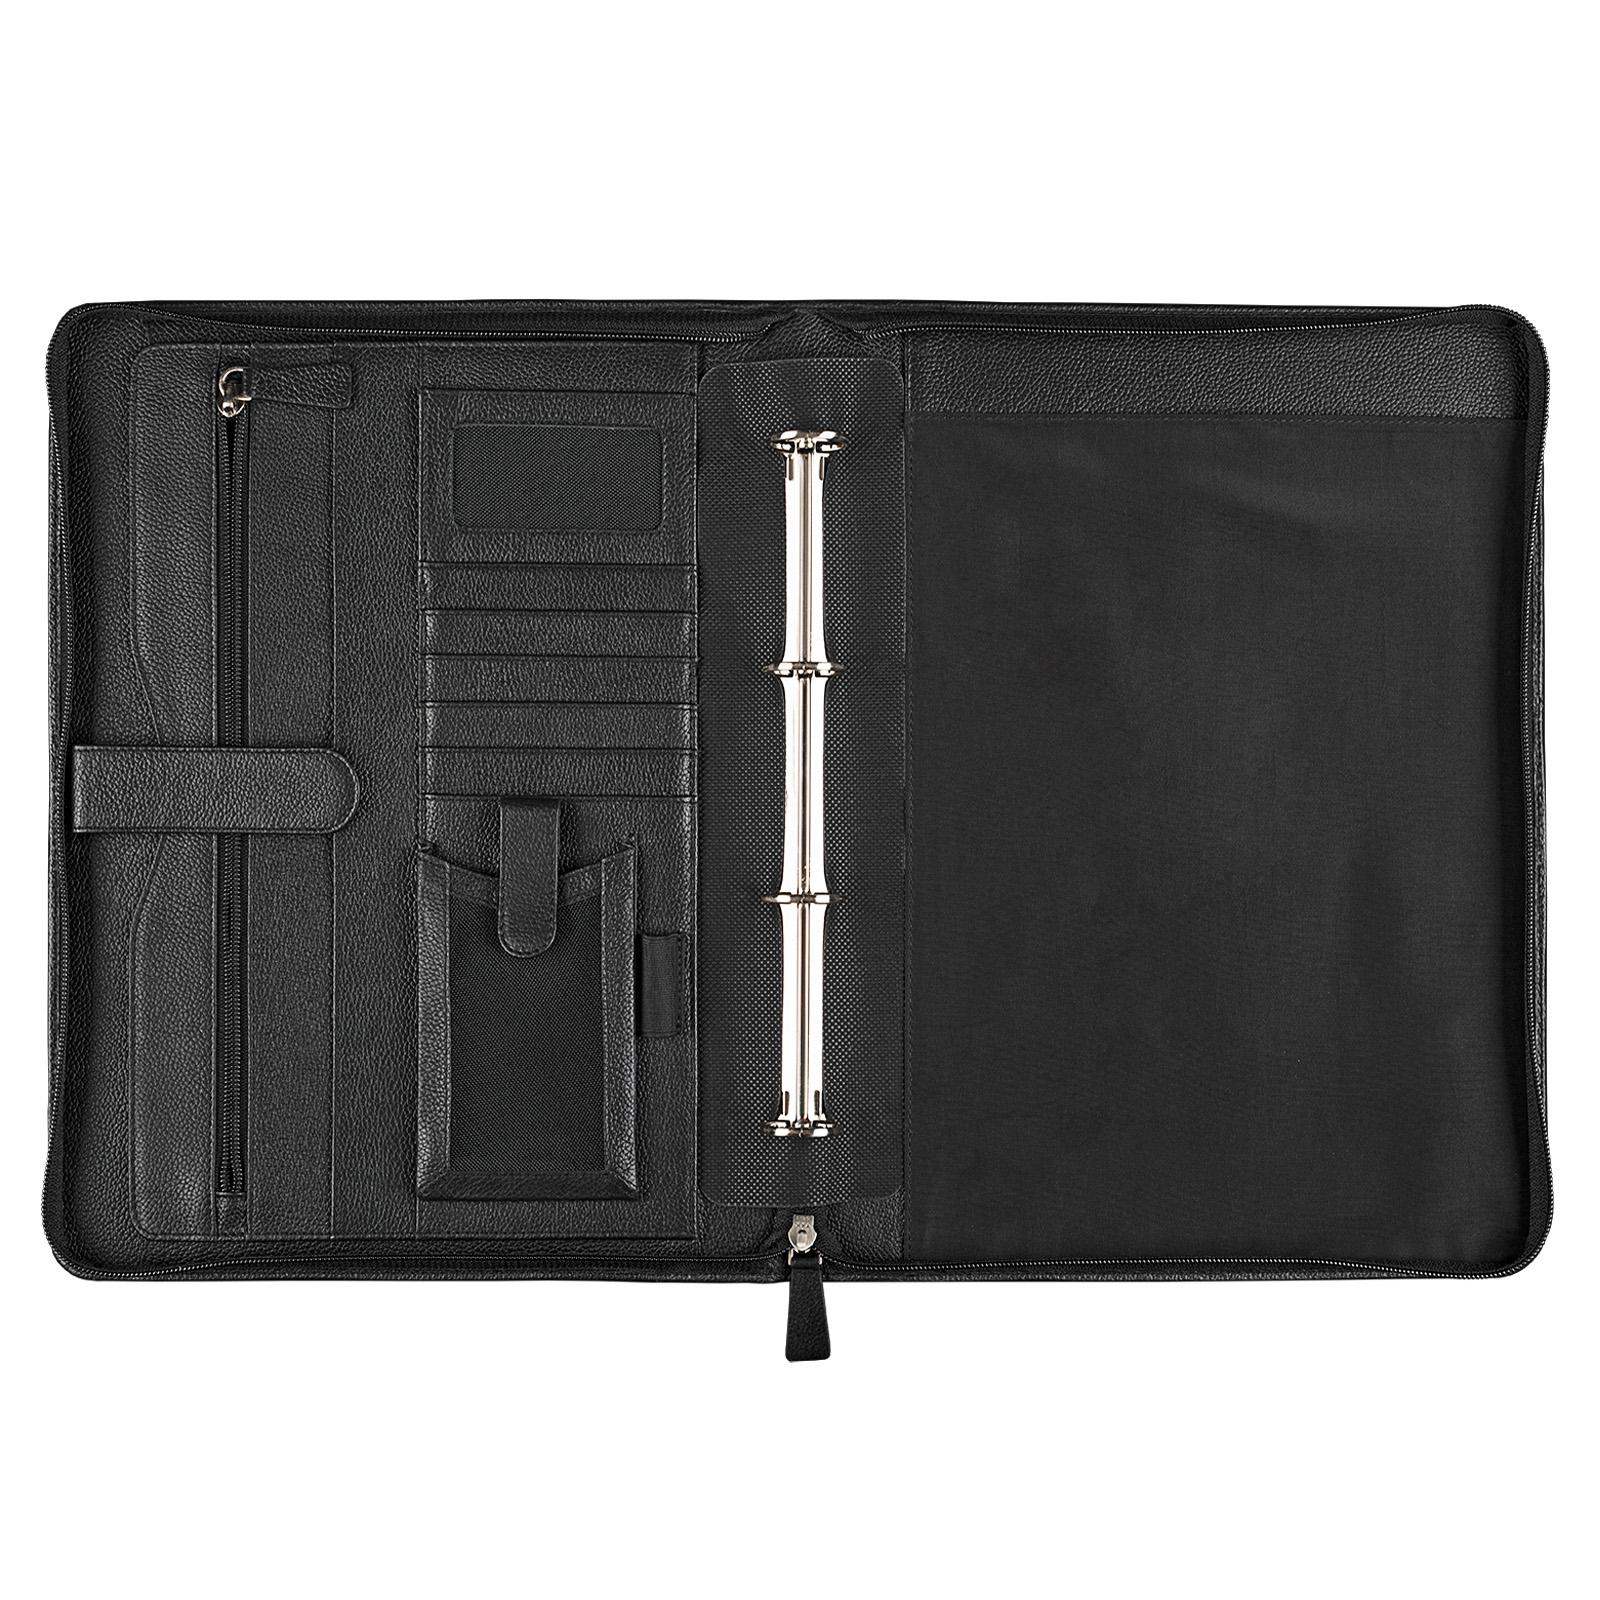 Dokumentenmappe A4 Leder schwarz mit Ringmechanik